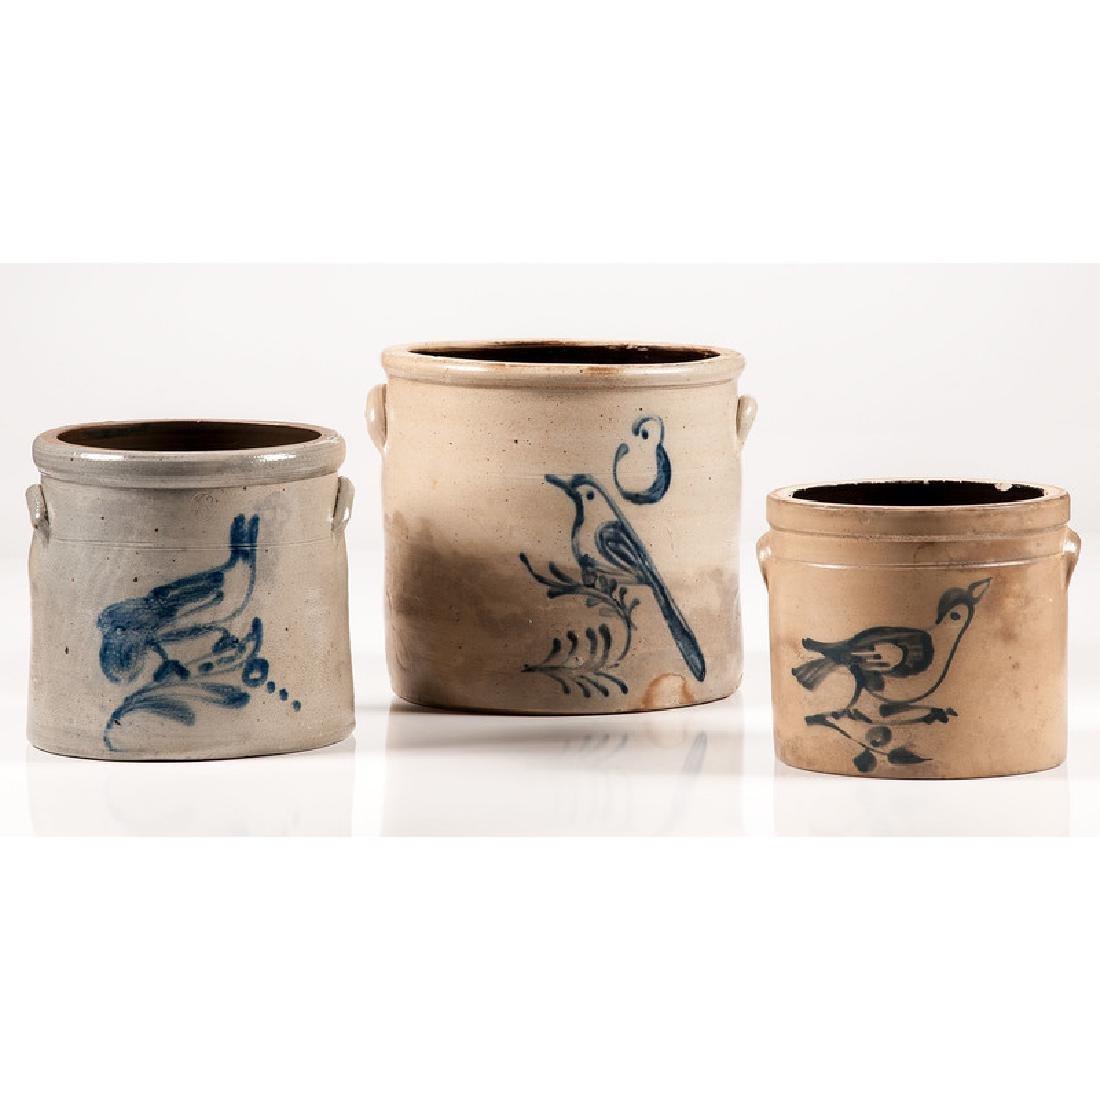 Stoneware Crocks with Bird Decoration